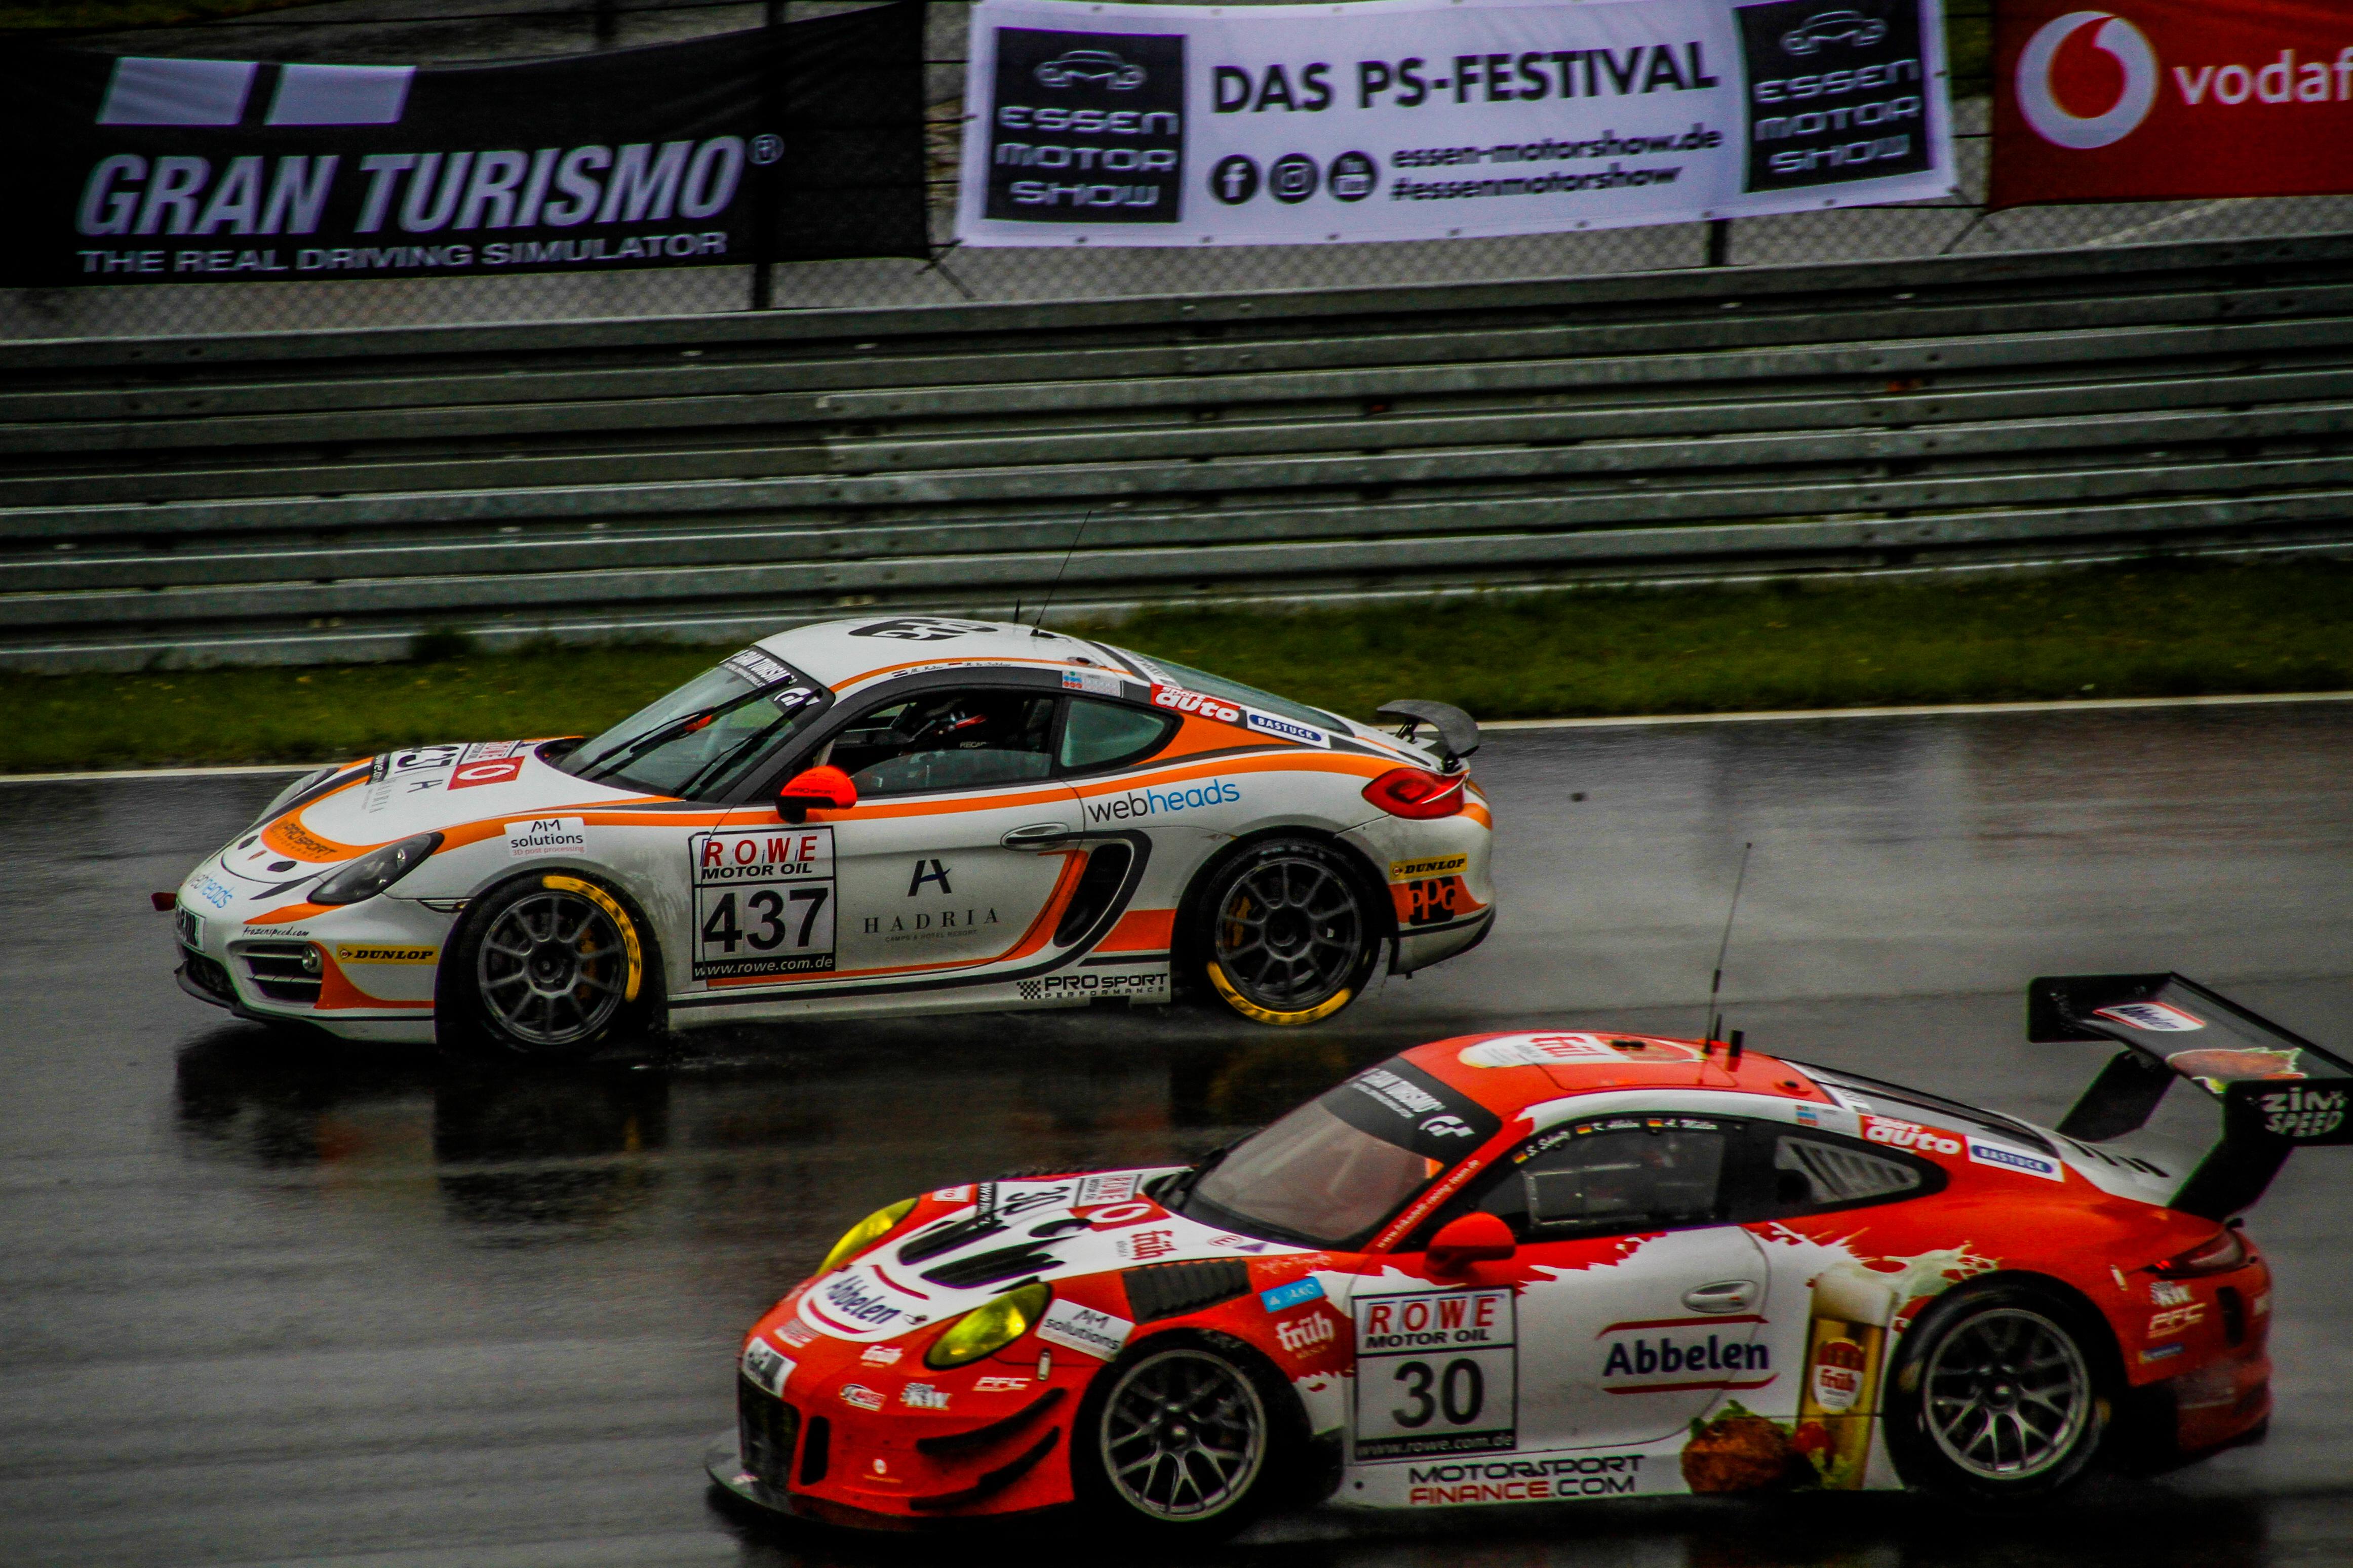 Nurburgring 24h motorsport to receive government funding